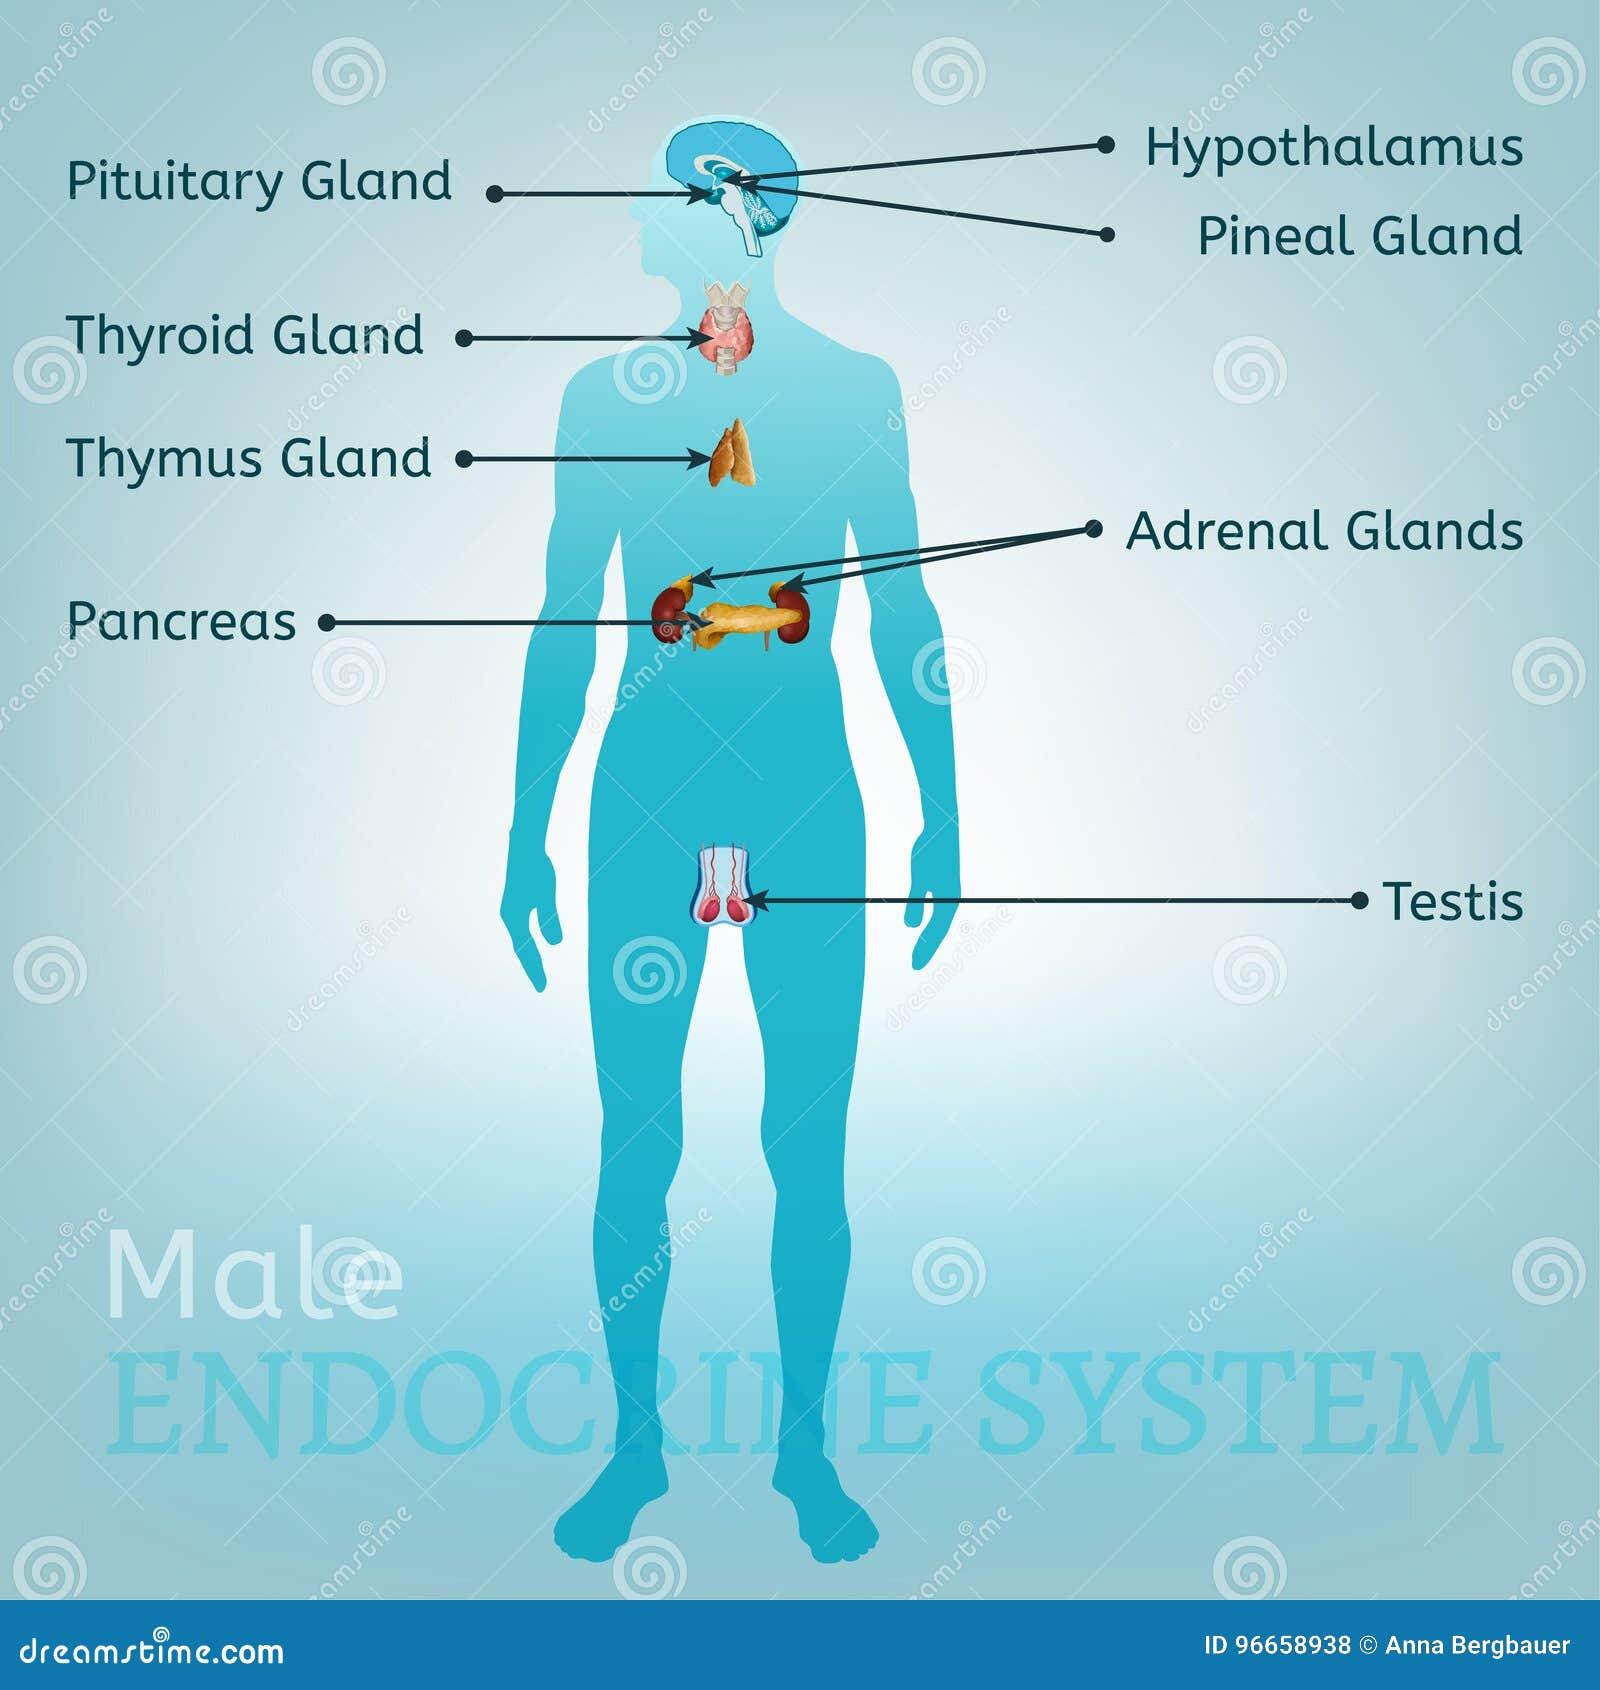 Endocrine System Image Stock Vector Illustration Of Endocrine